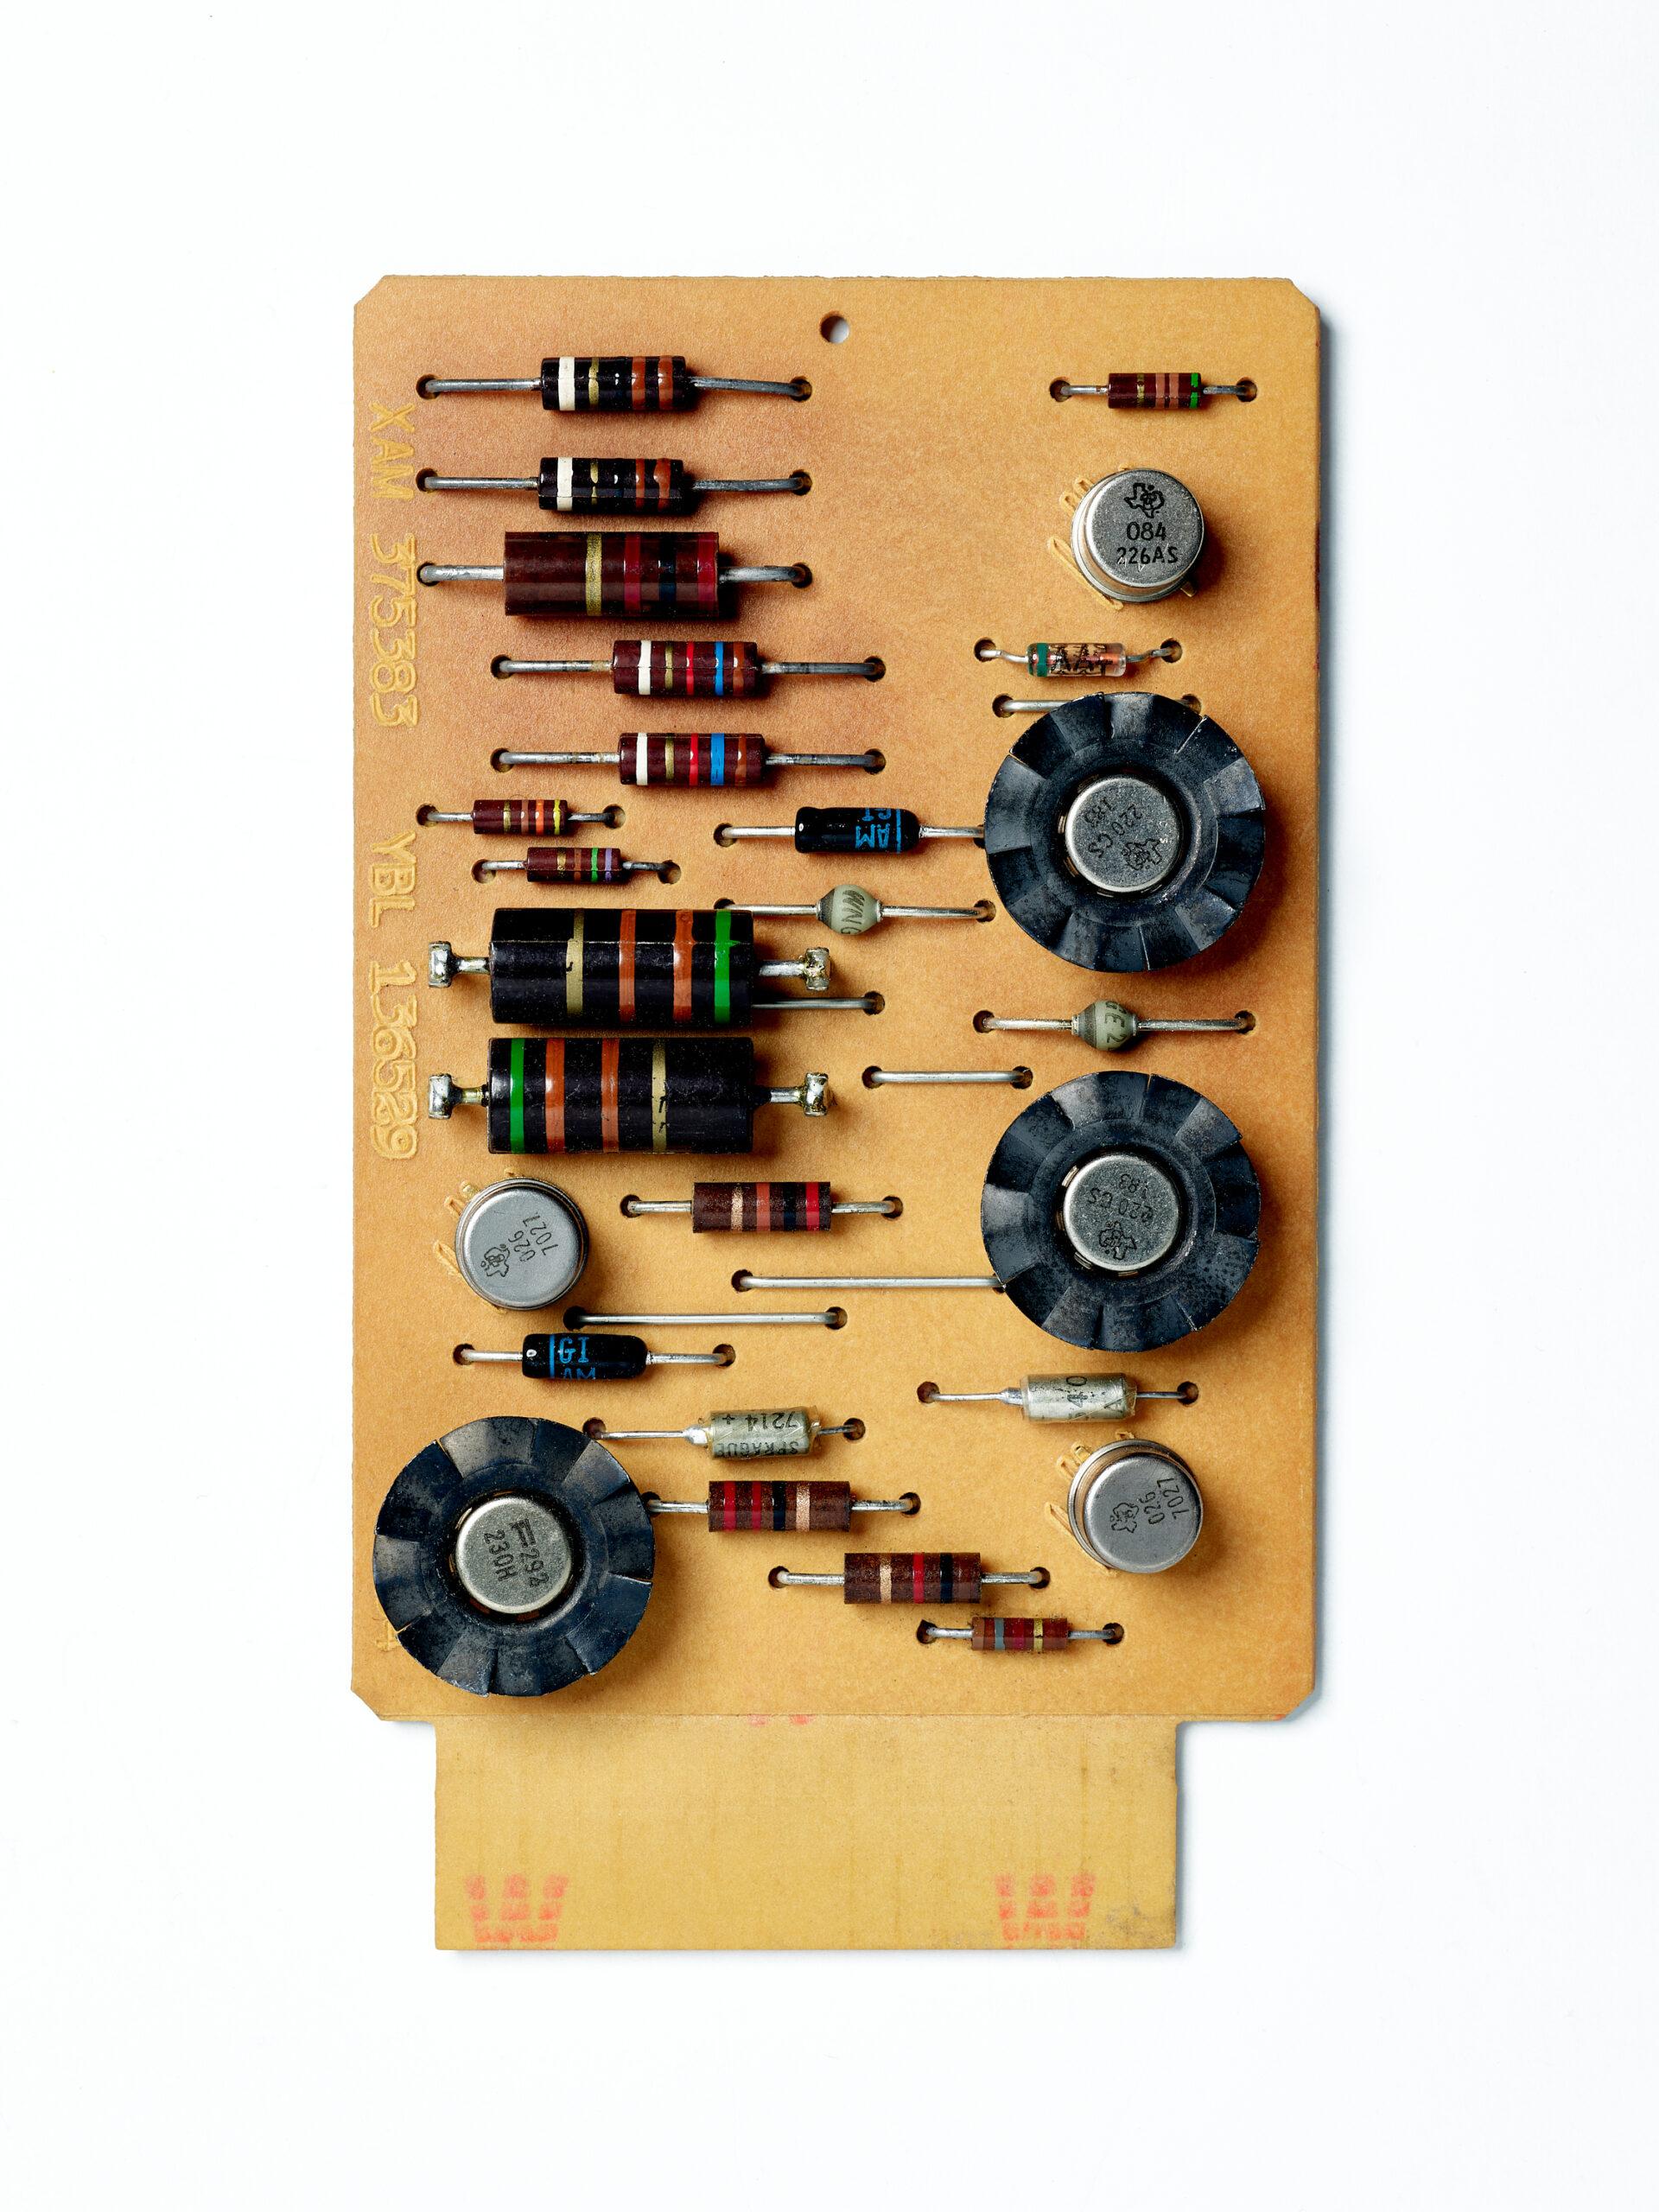 IBM SMS Card XAM. SMS Card, circuit board, computer, mainframe, tech history, transistors, vintage computing.